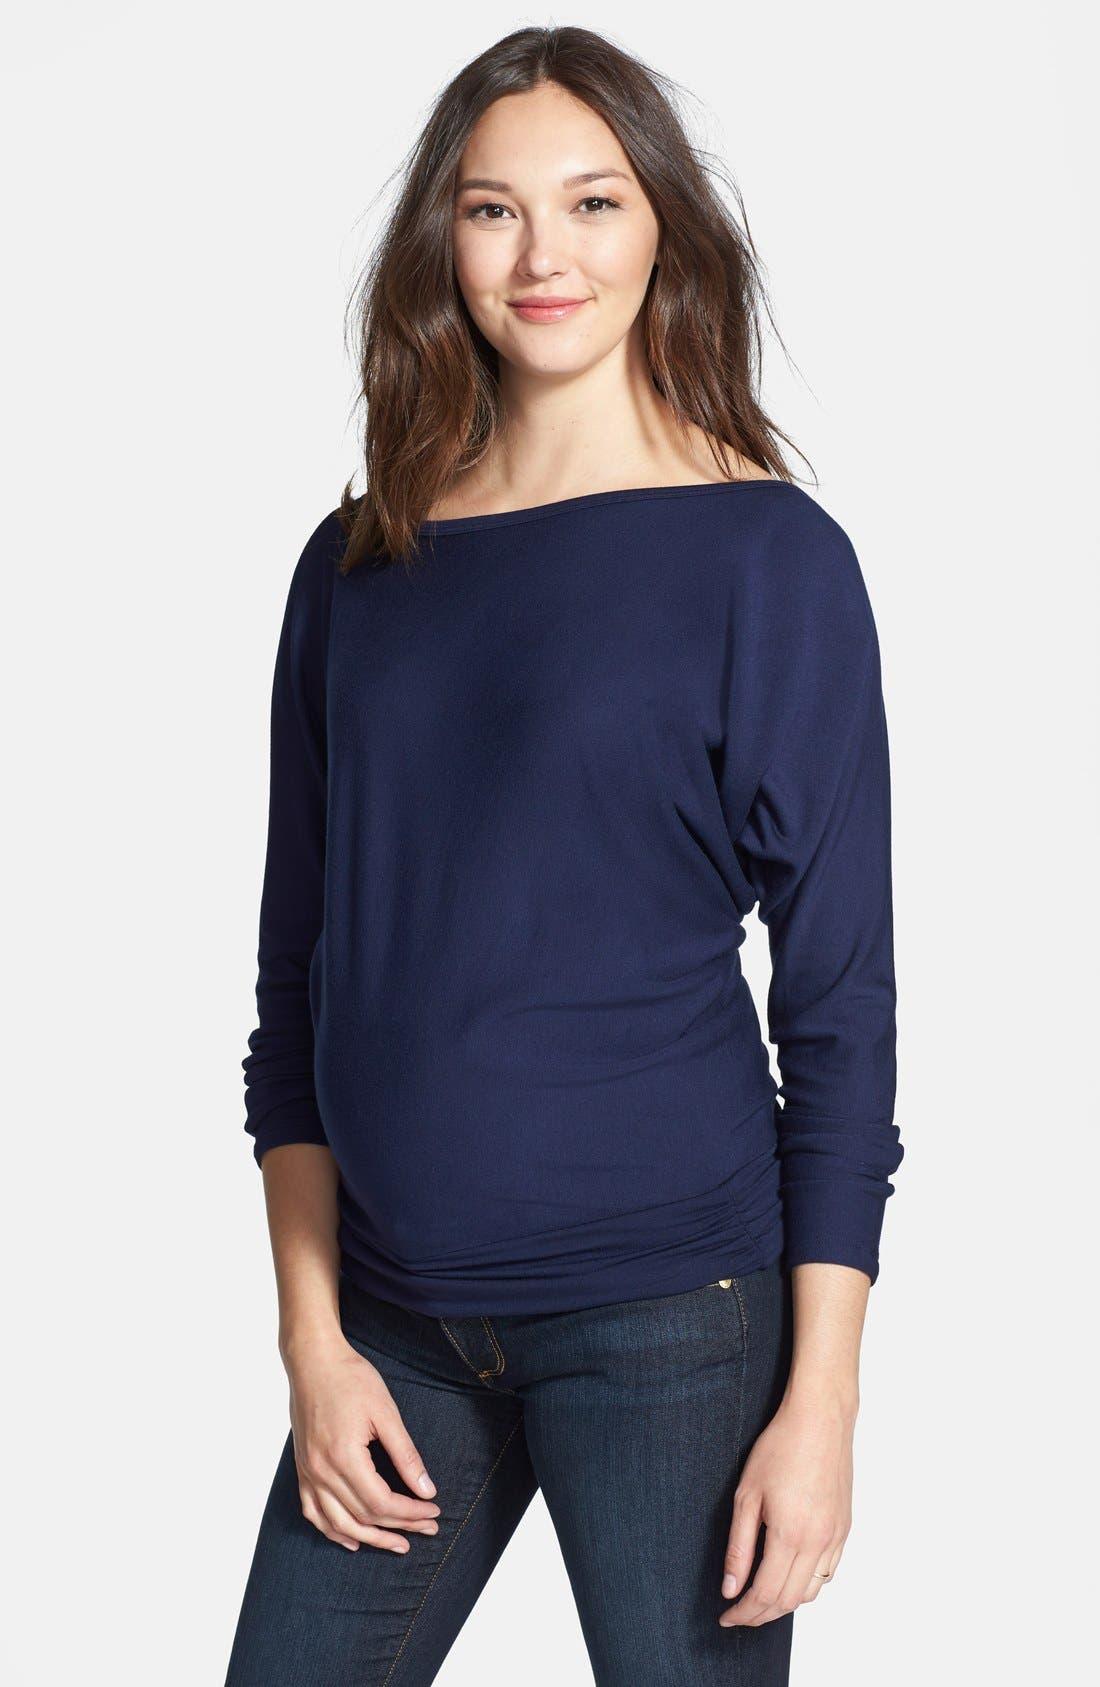 Alternate Image 1 Selected - Tart Maternity 'Yvonne' Long Sleeve Maternity Sweatshirt